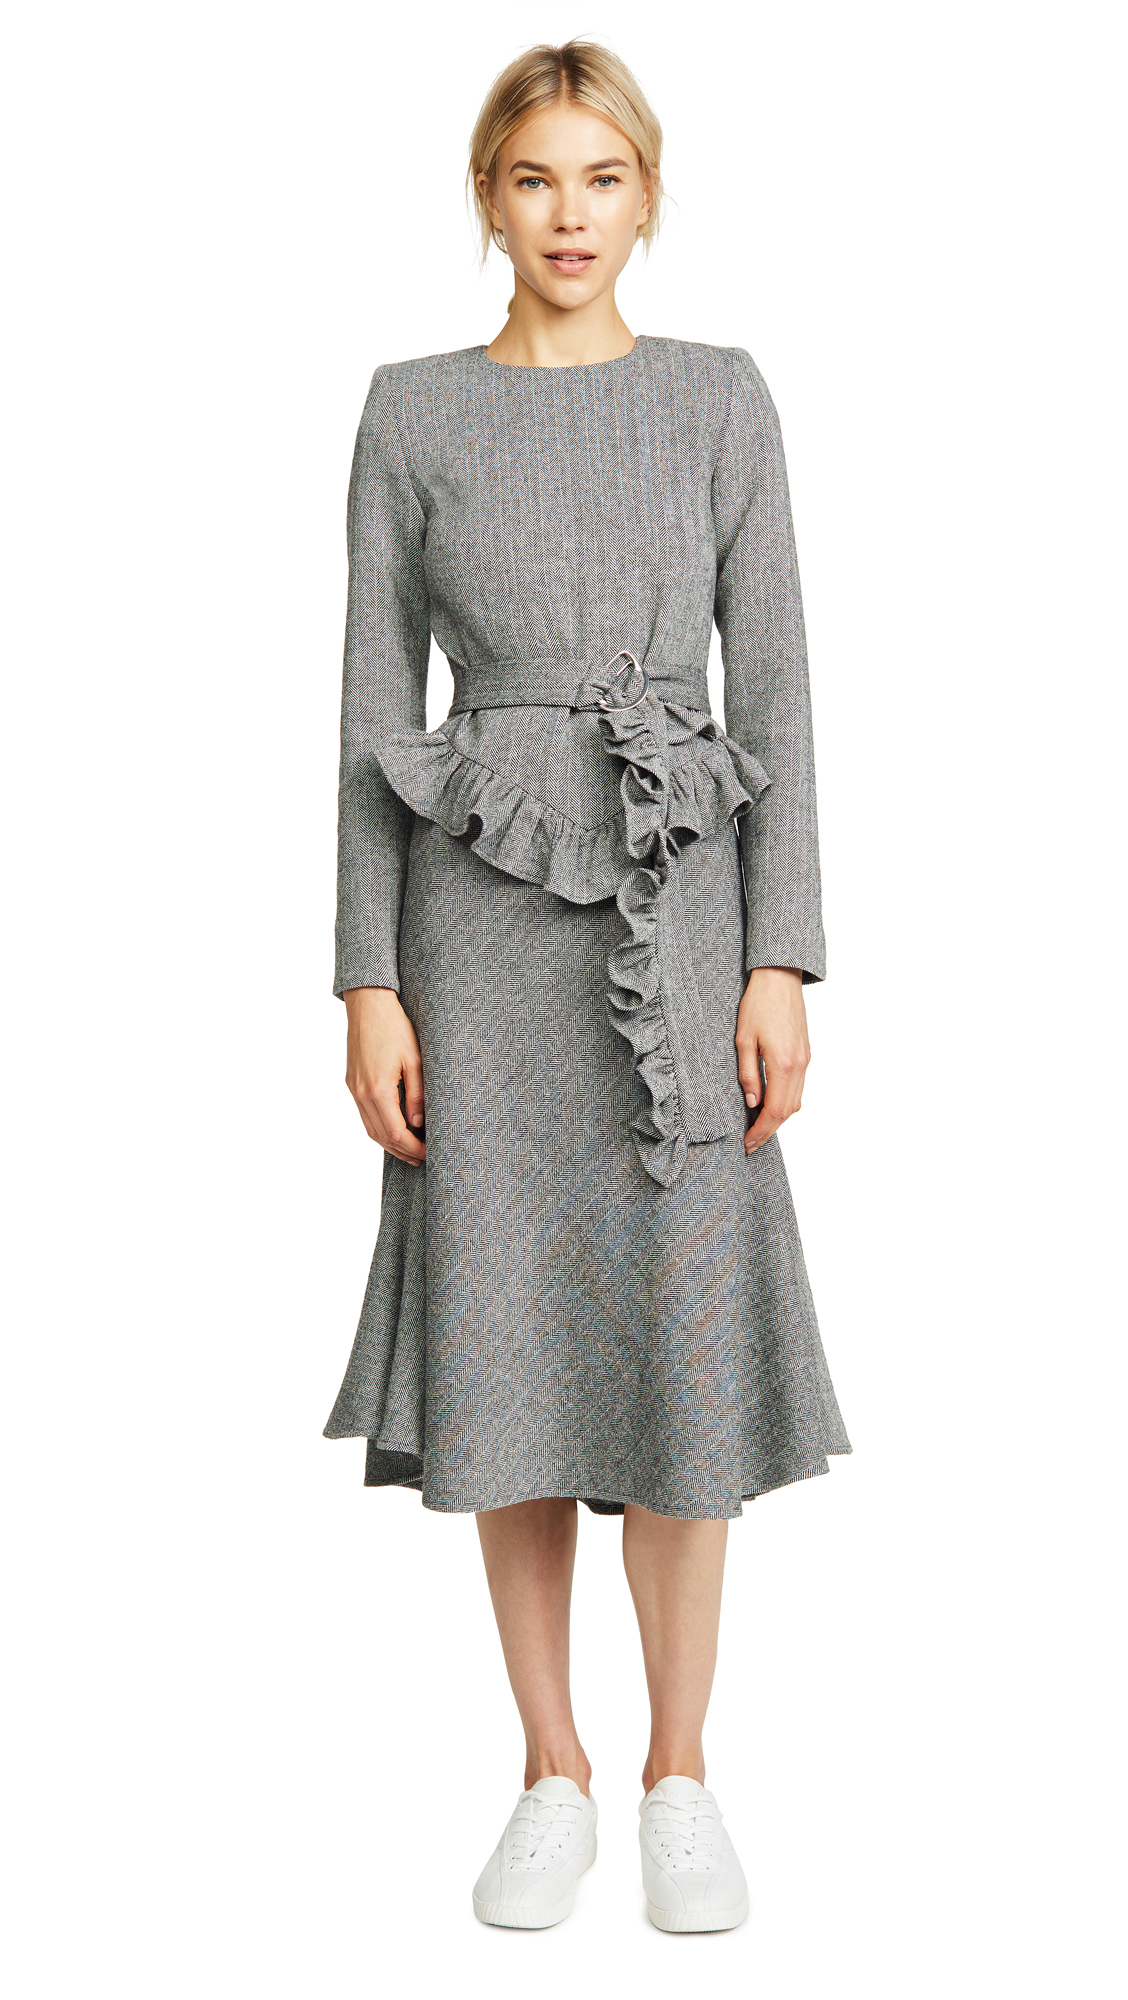 Maggie Marilyn Kindness Breeds Kindness Dress